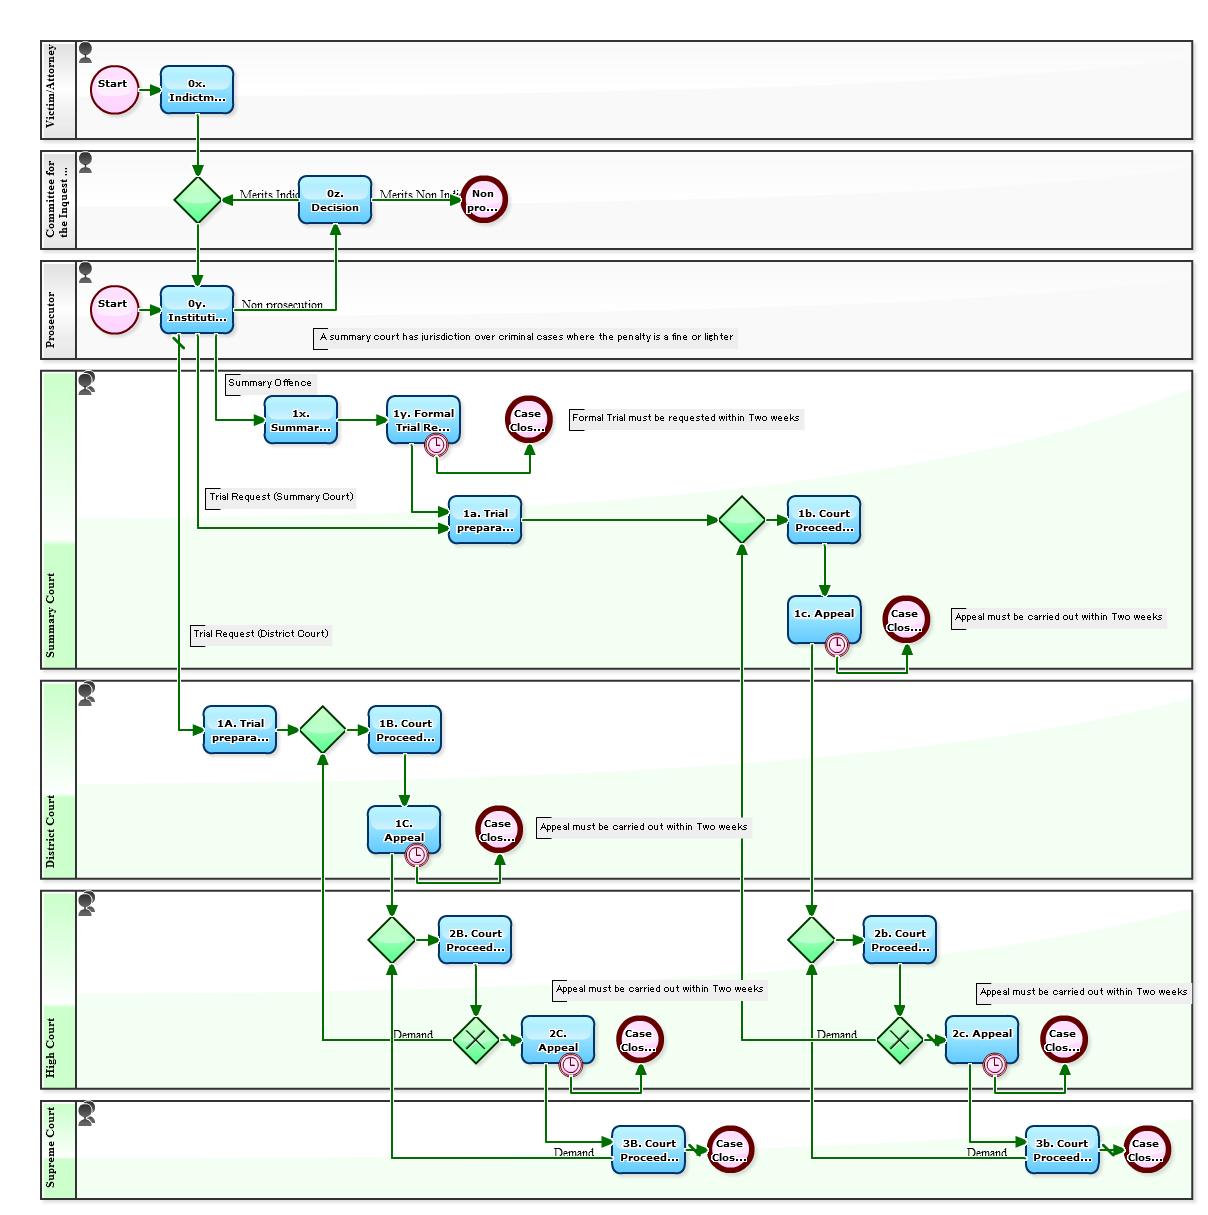 criminal procedure diagram vw polo 2006 wiring workflow sample august 2015